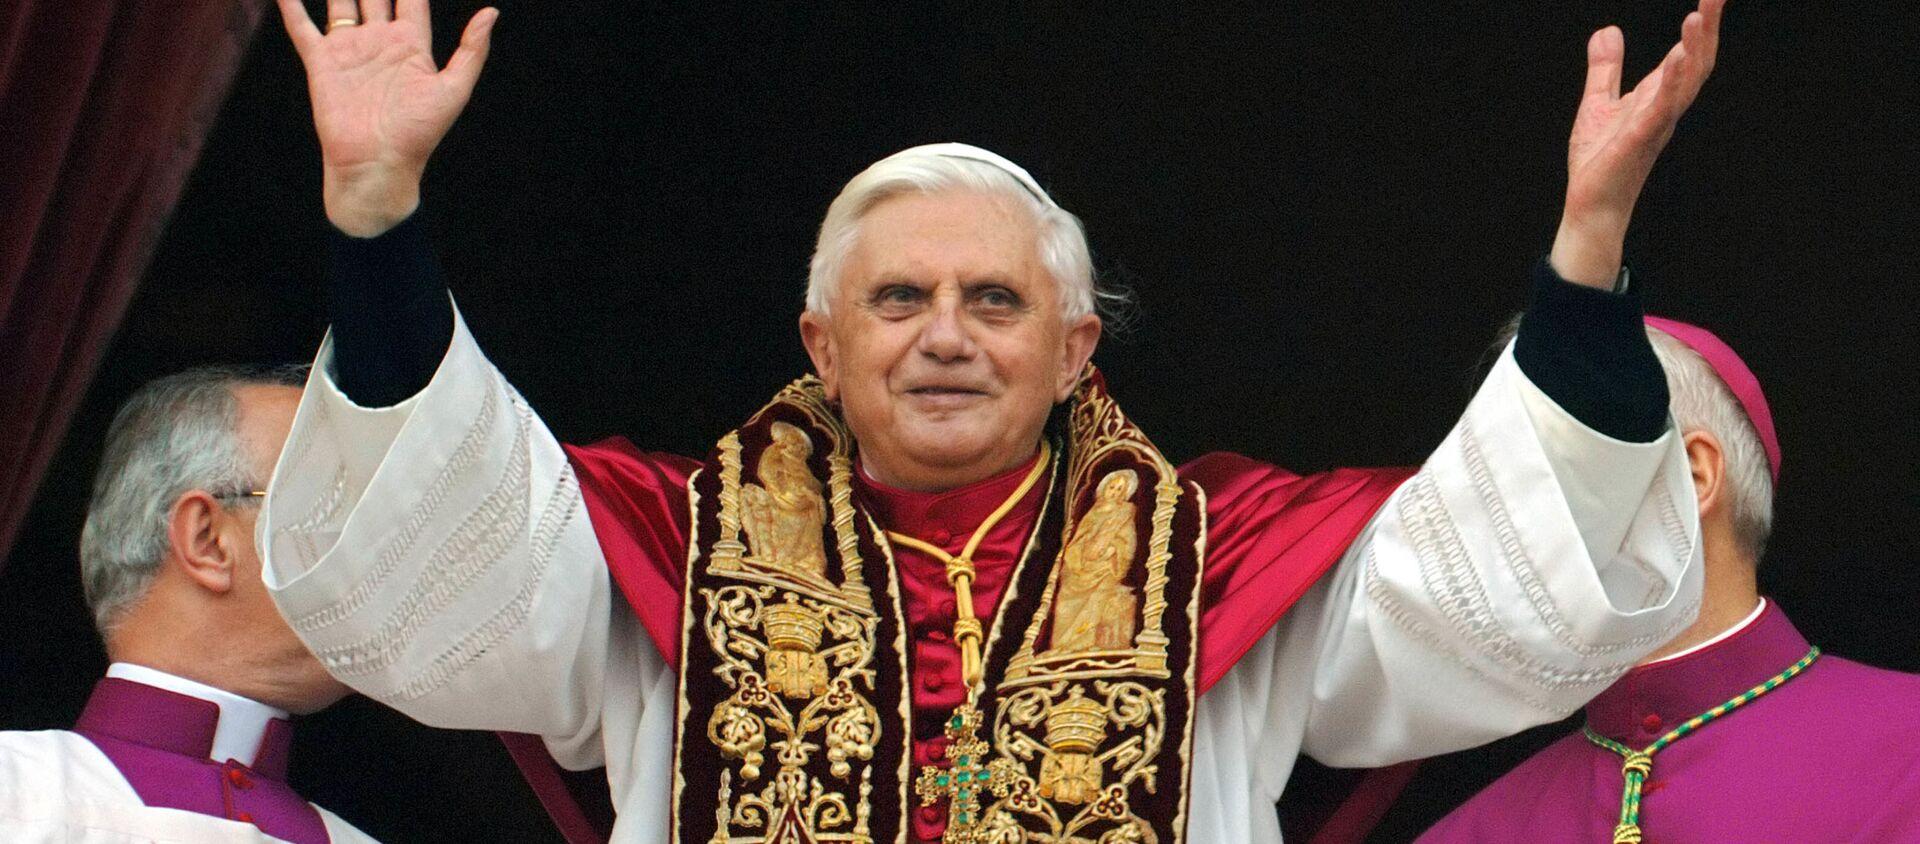 El papa Benedicto - Sputnik Mundo, 1920, 14.01.2020